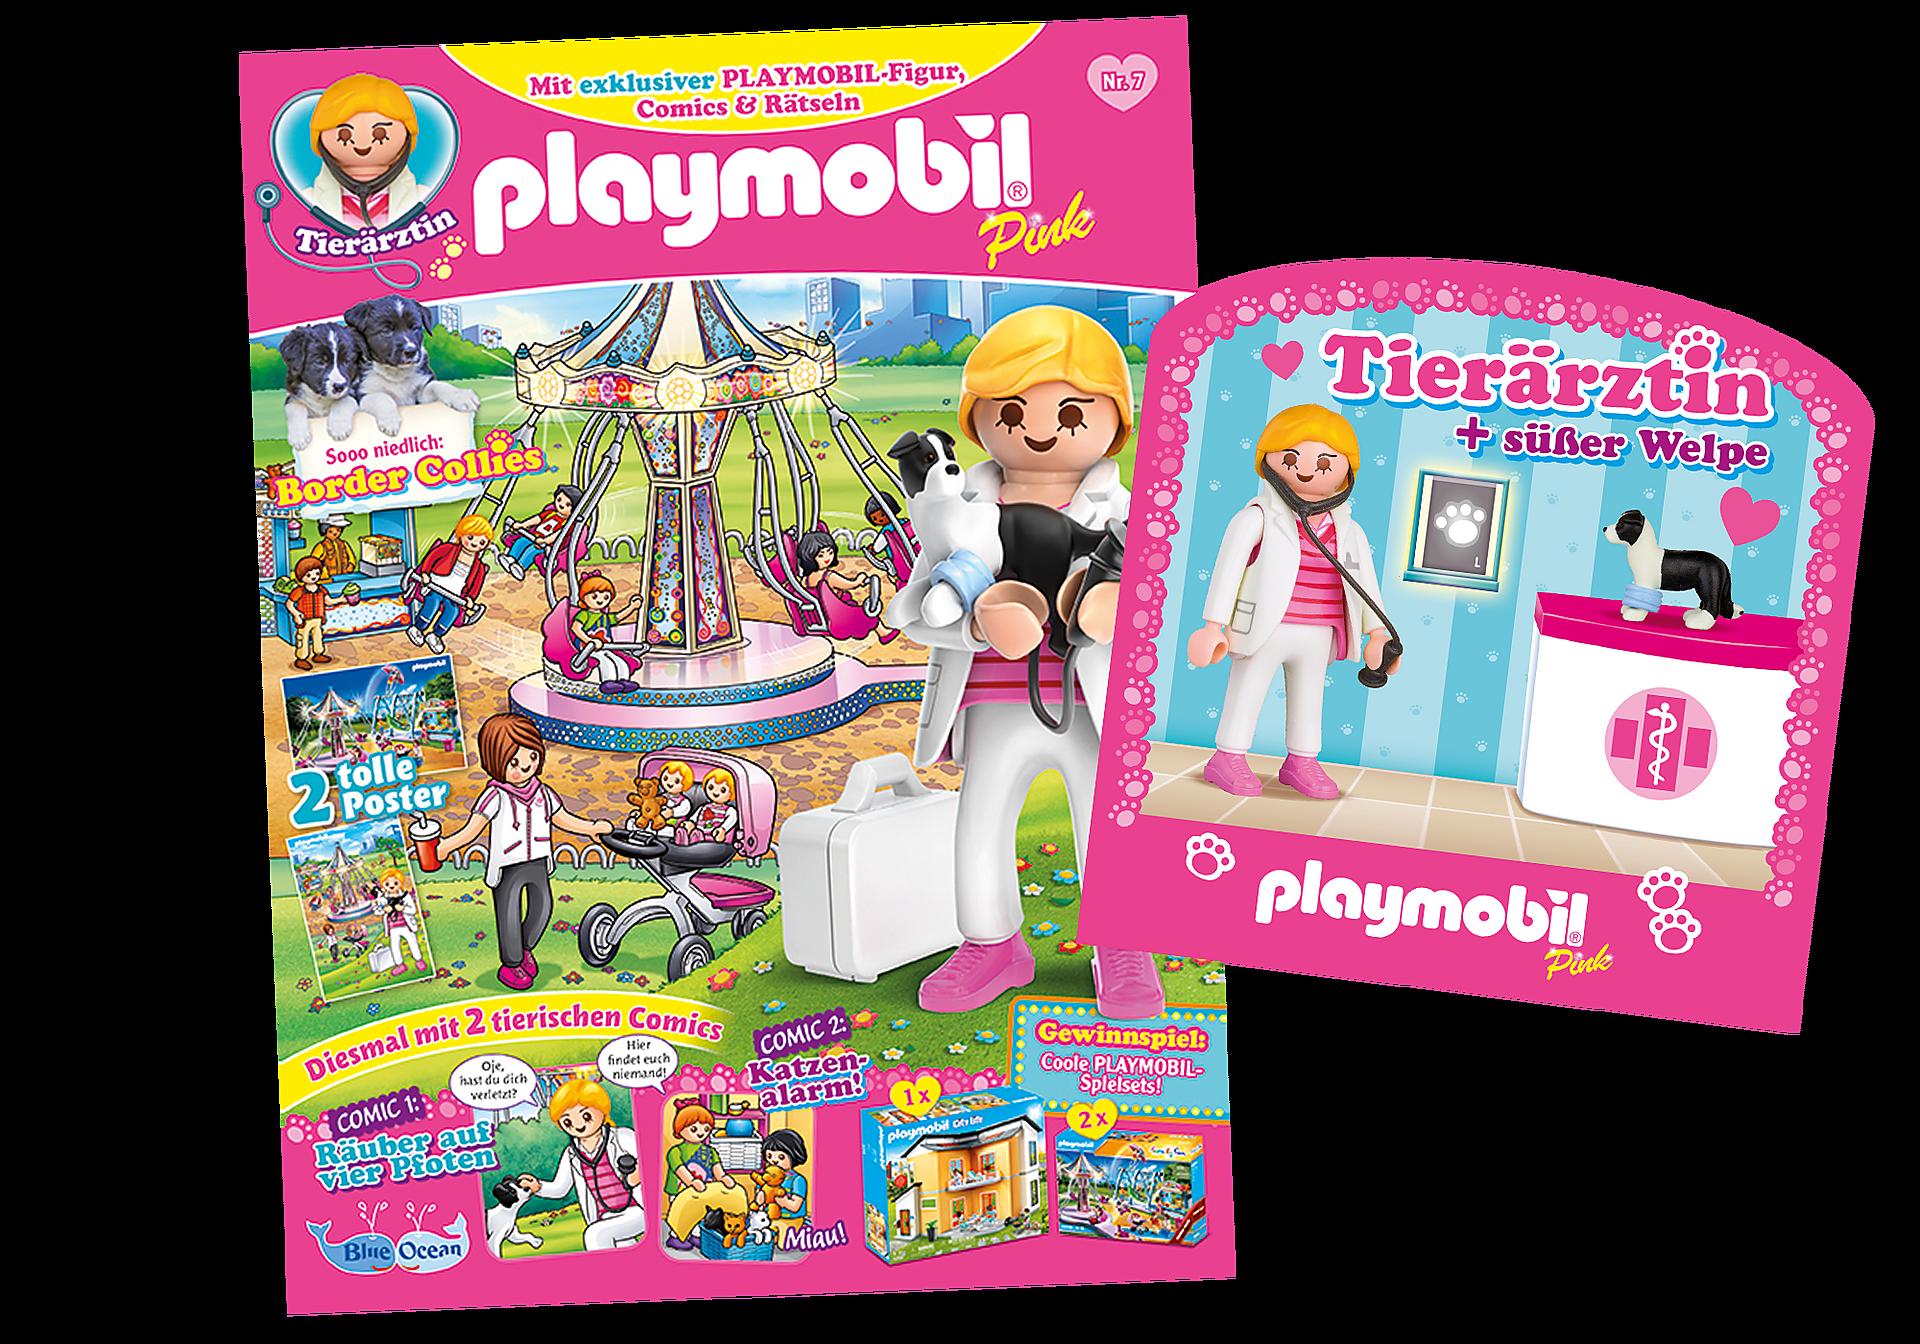 80686 PLAYMOBIL-Magazin Pink 7/2021 (Heft 65) zoom image1